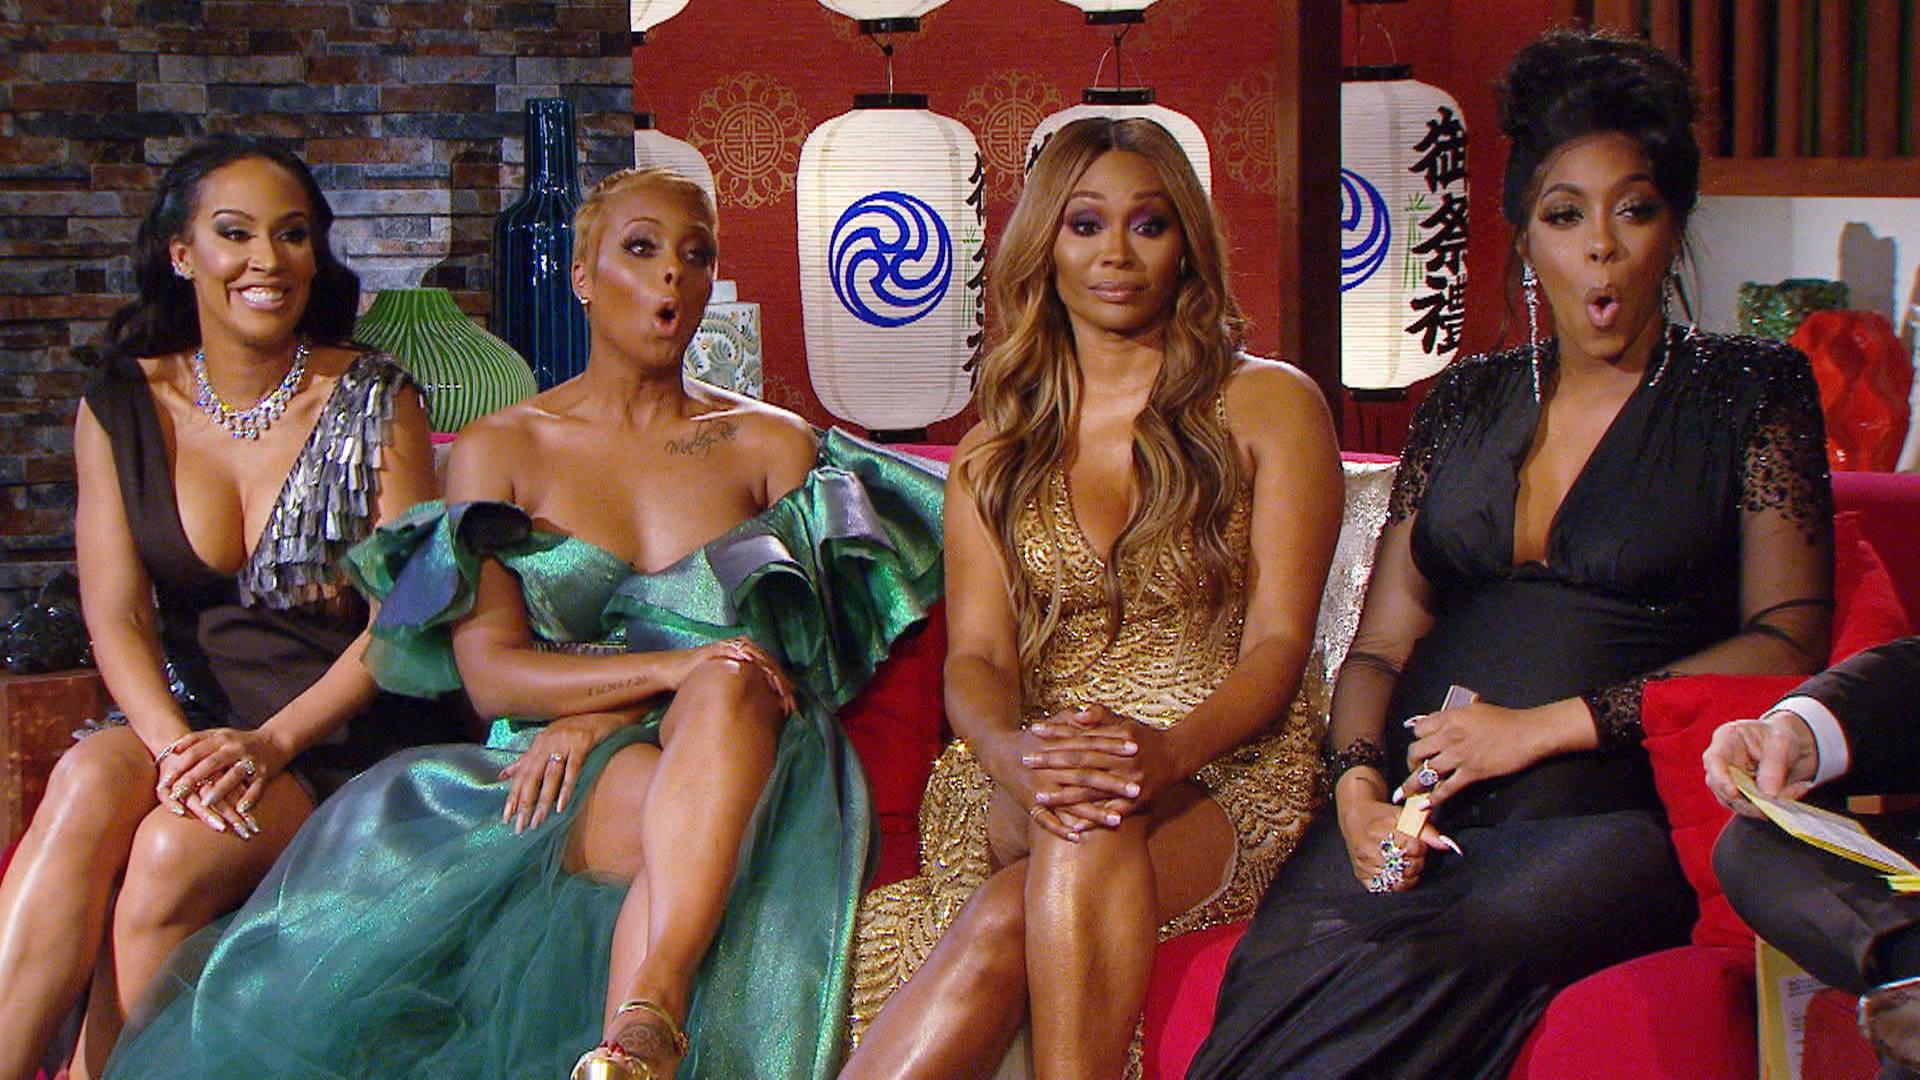 real housewives of atlanta season 5 episode 14 delishows